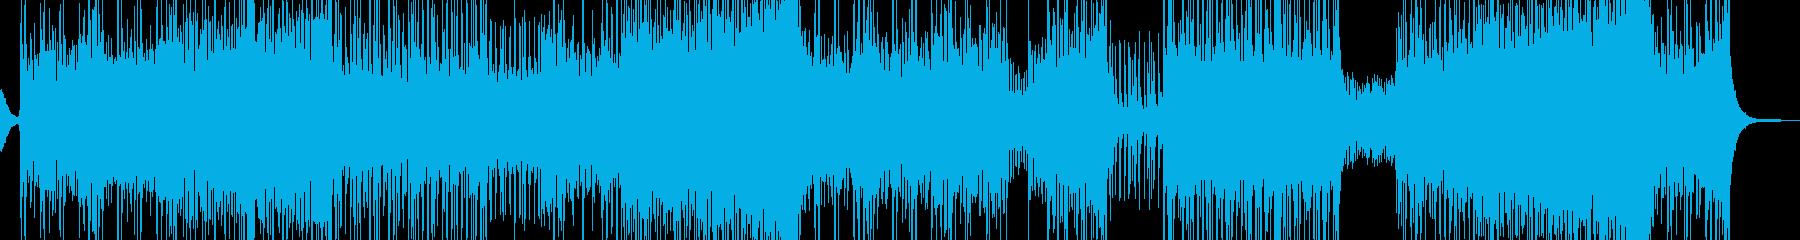 RPG・砂漠を想定した激しいテクノ 長尺の再生済みの波形